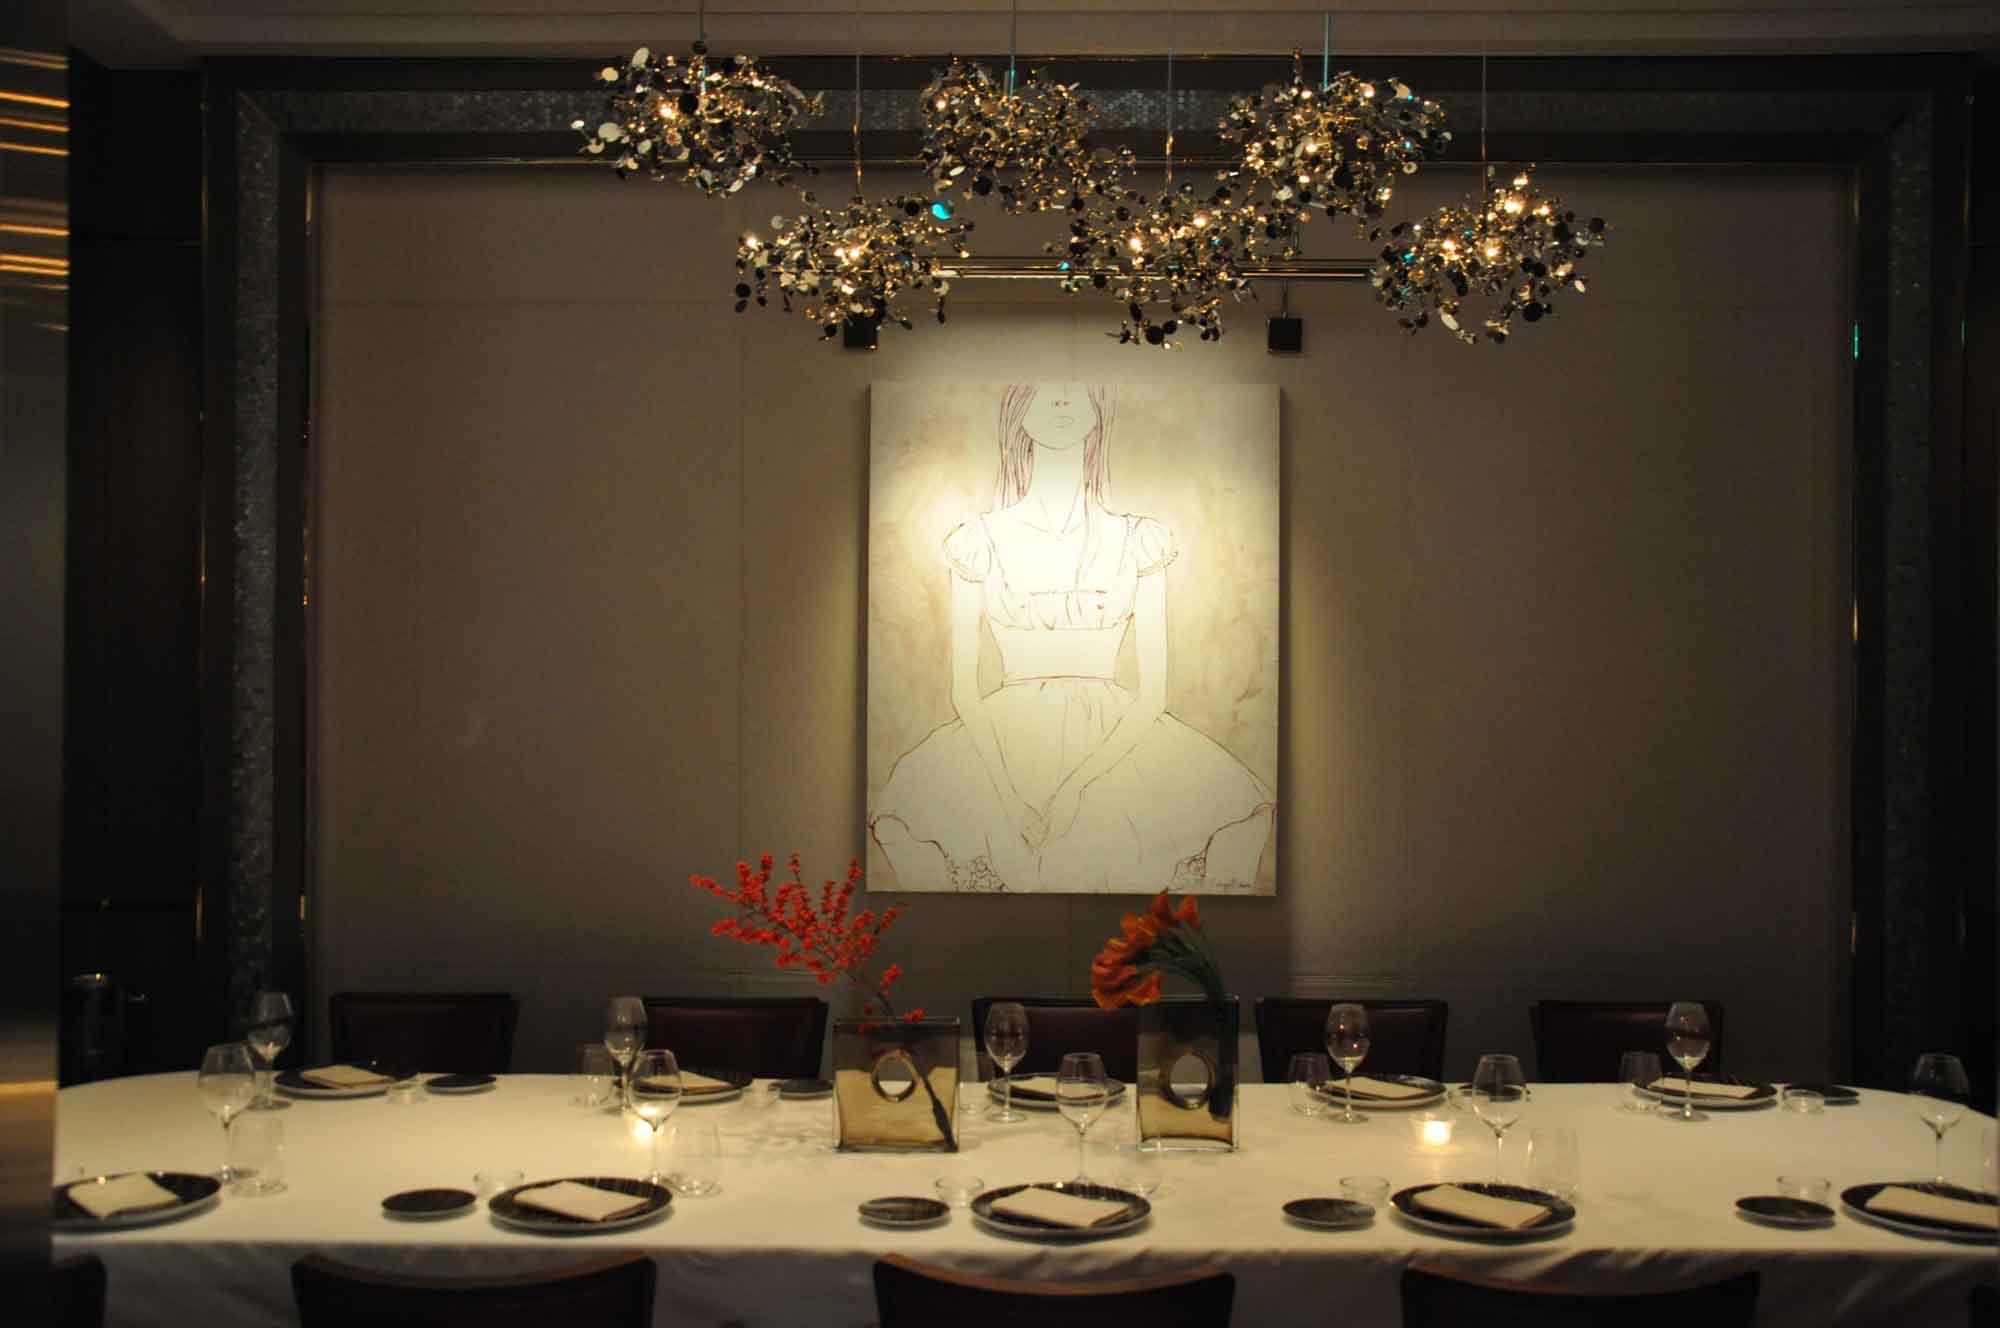 8.5 Otto e Mezzo Bombana Macau table and painting